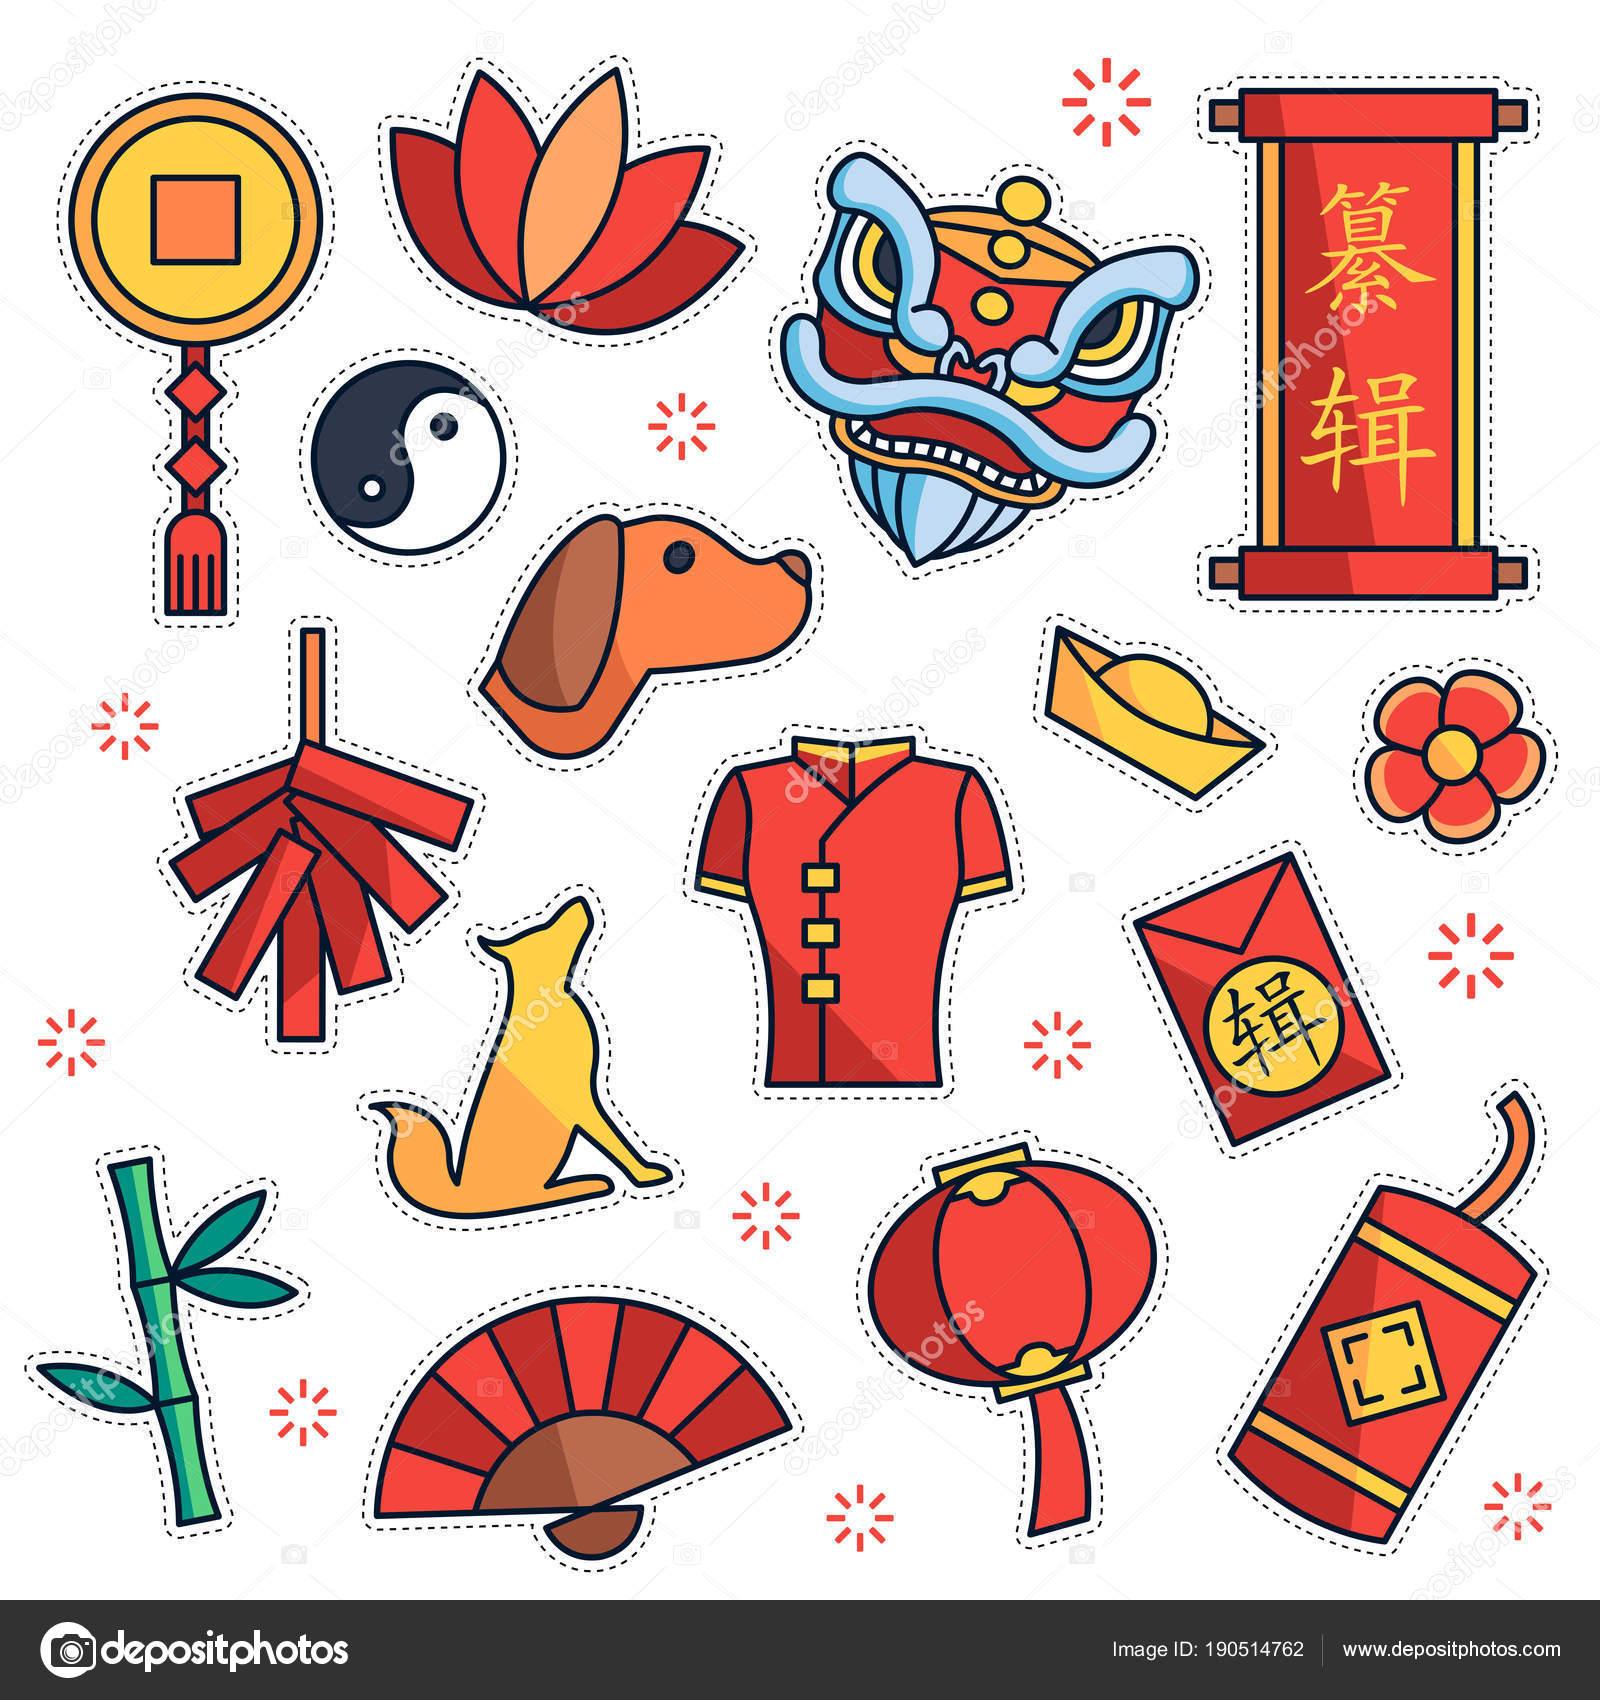 Vintage 80s 90s Chinese New Year Fashion Cartoon Illustration Set